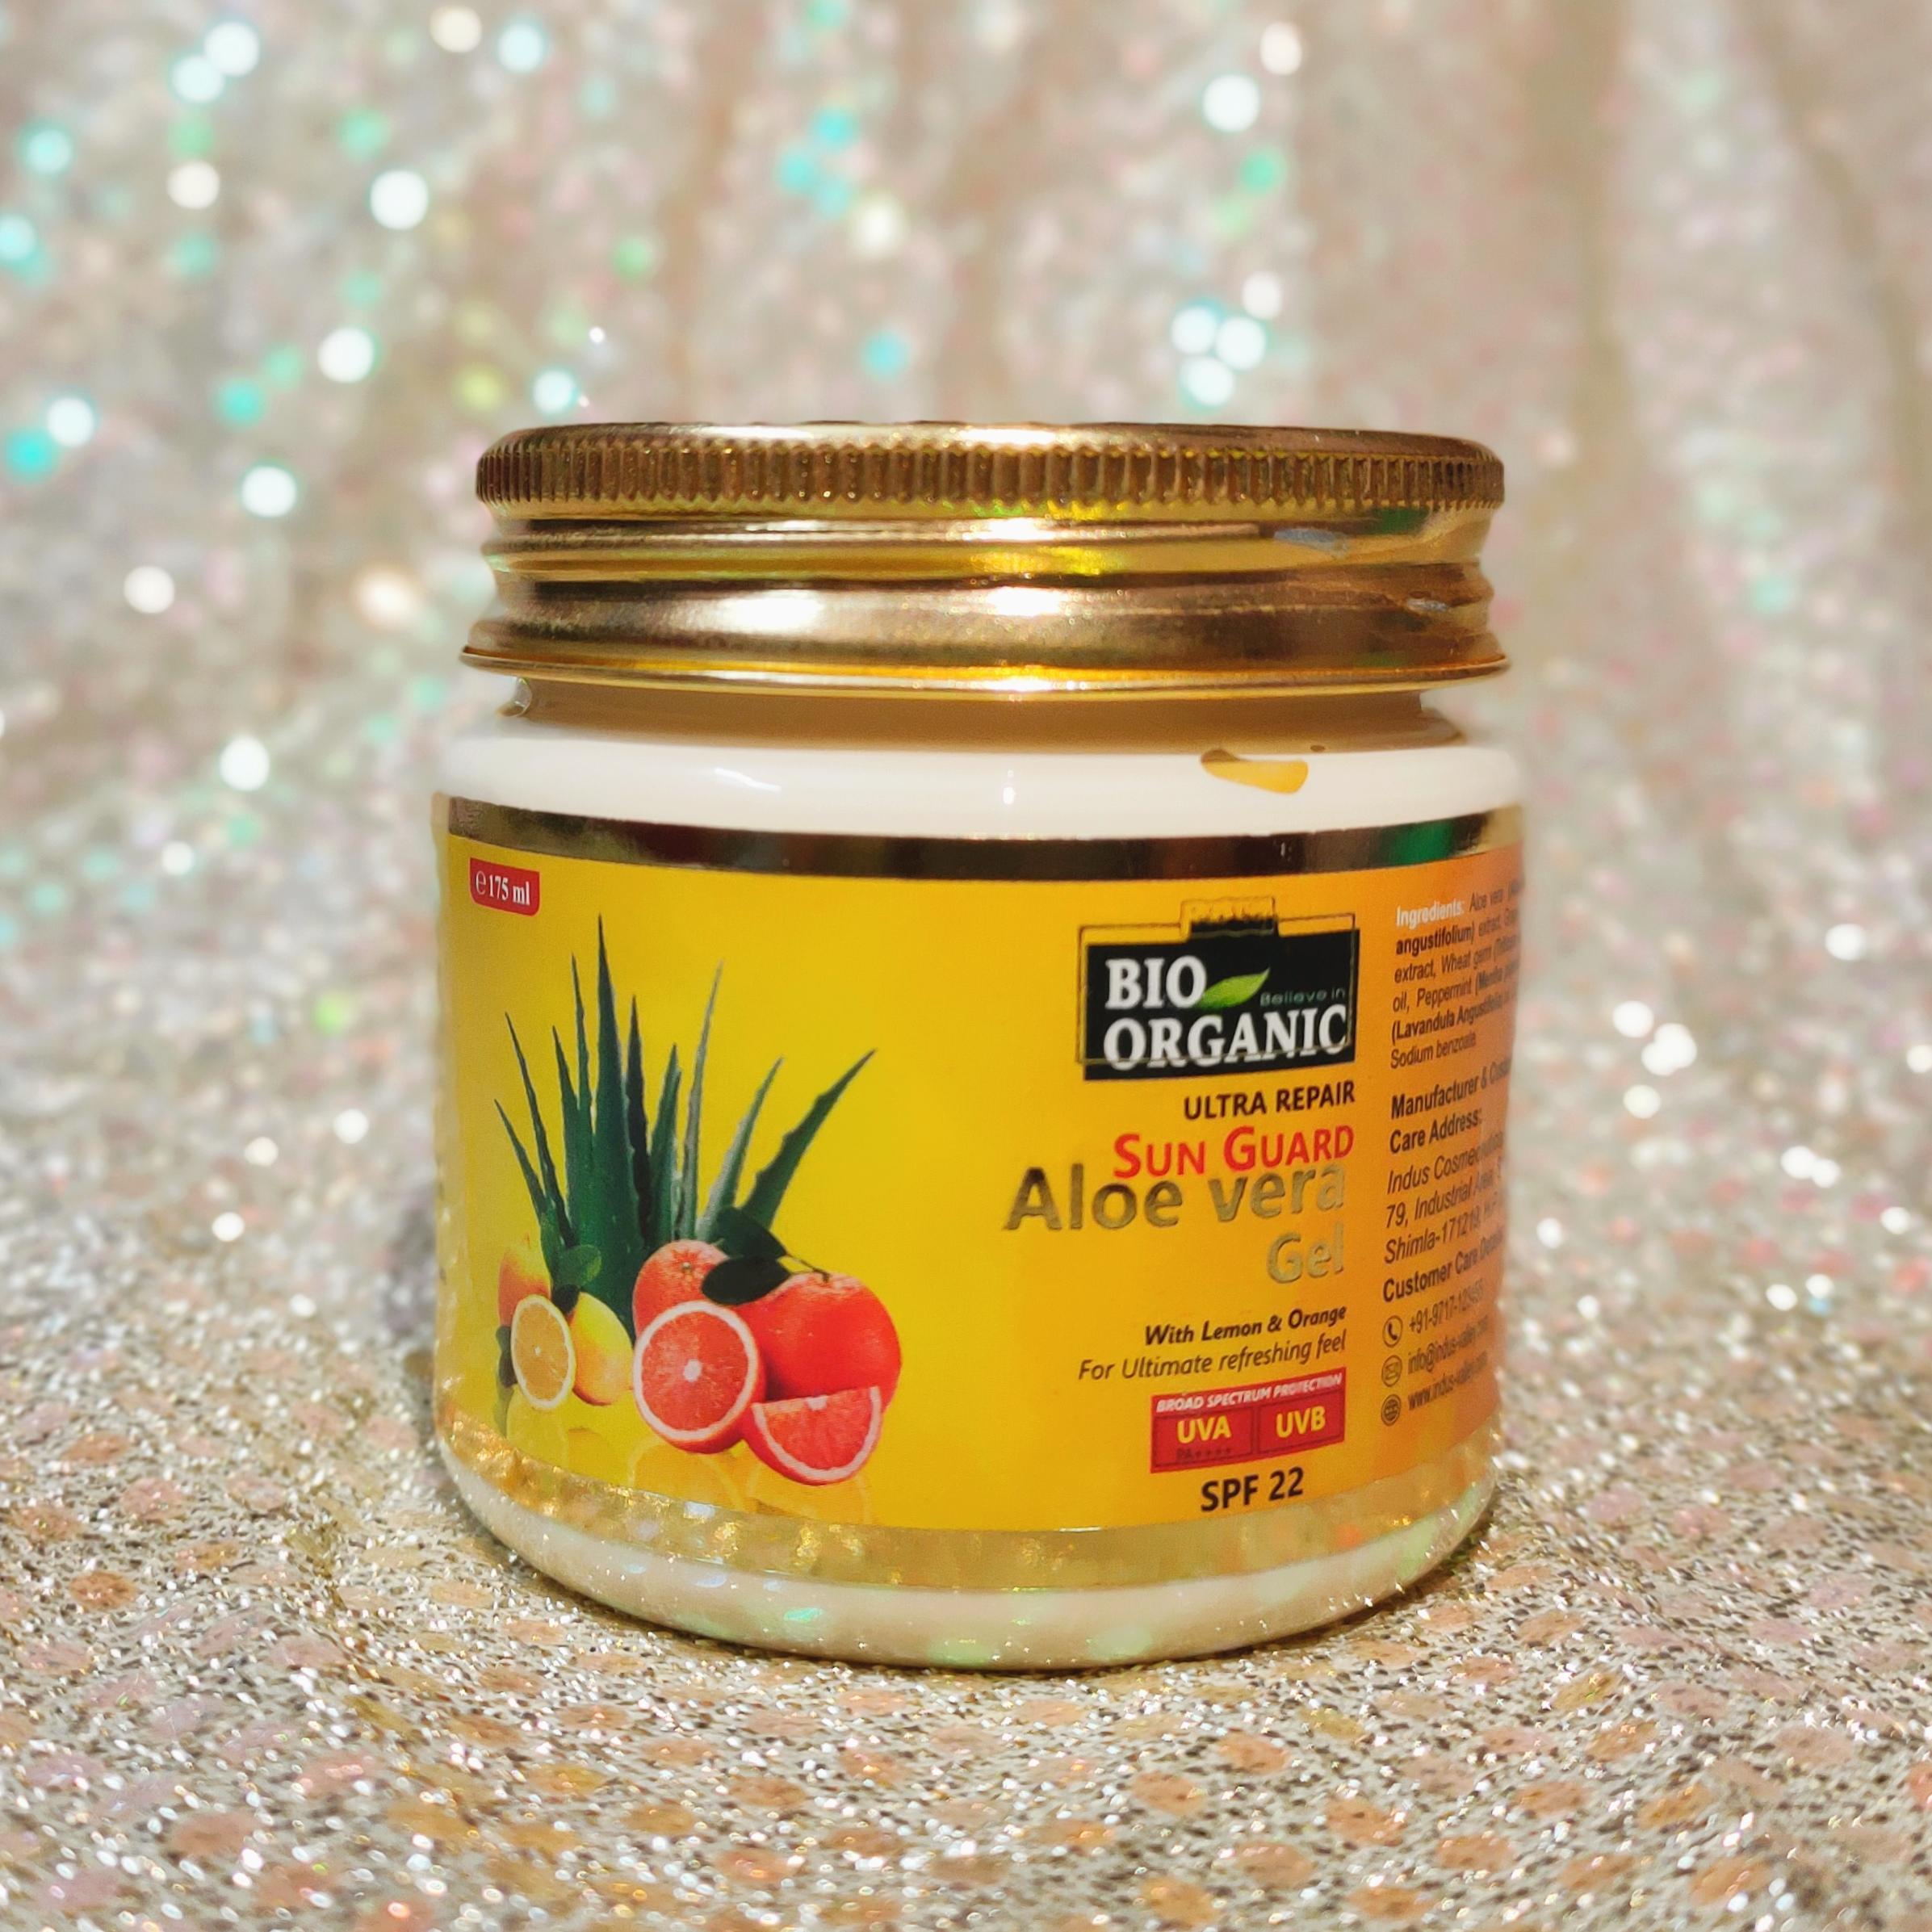 Indus Valley Bio Organic Sun Guard Aloe Vera Gel With Lemon & Orange-SPF 22-Perfect texture for all skin type-By meghagupta-2